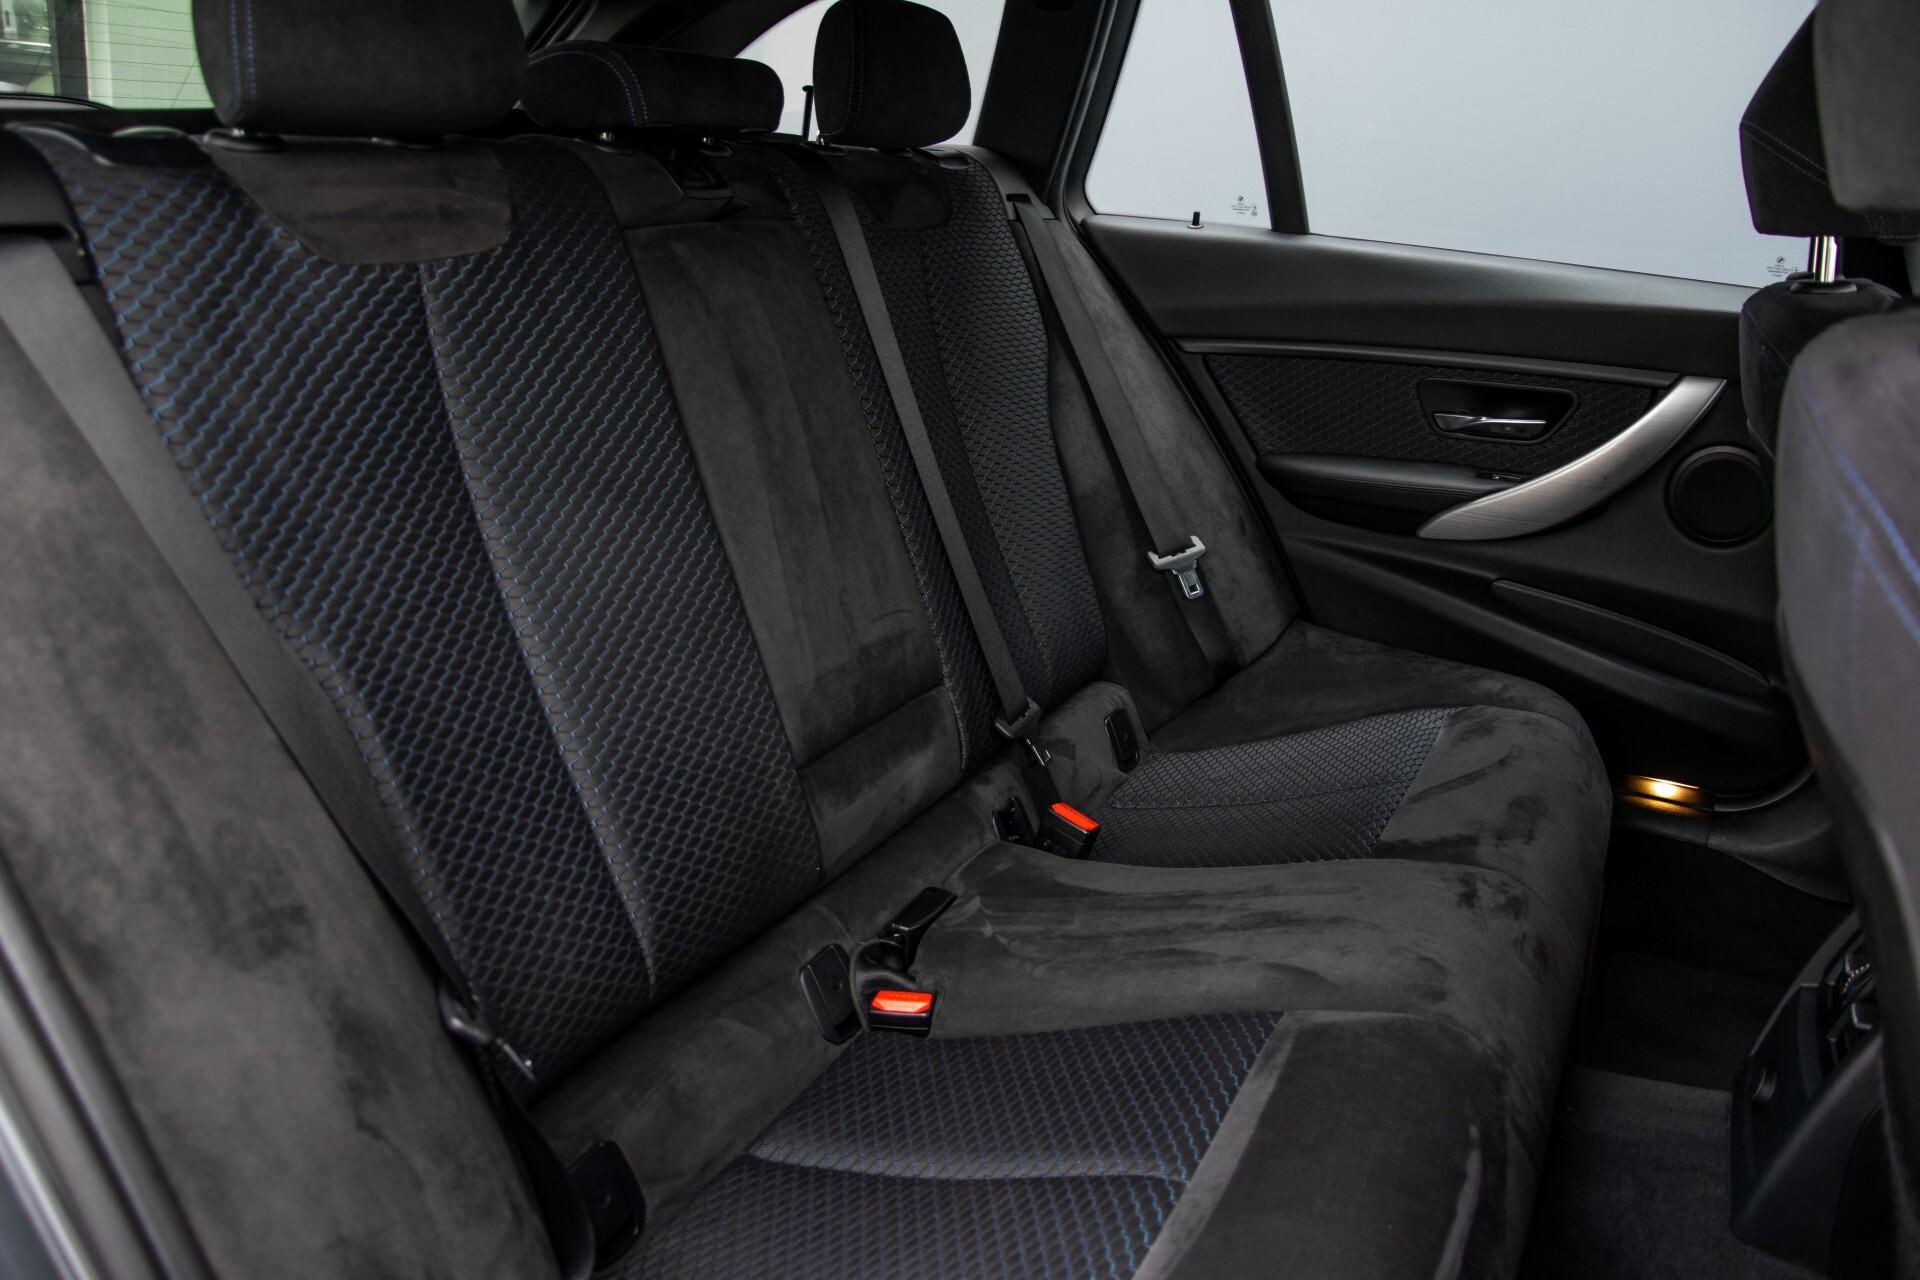 BMW 3 Serie Touring 316i M-Sportpakket Executive NL Auto/NAP Aut8 Foto 4